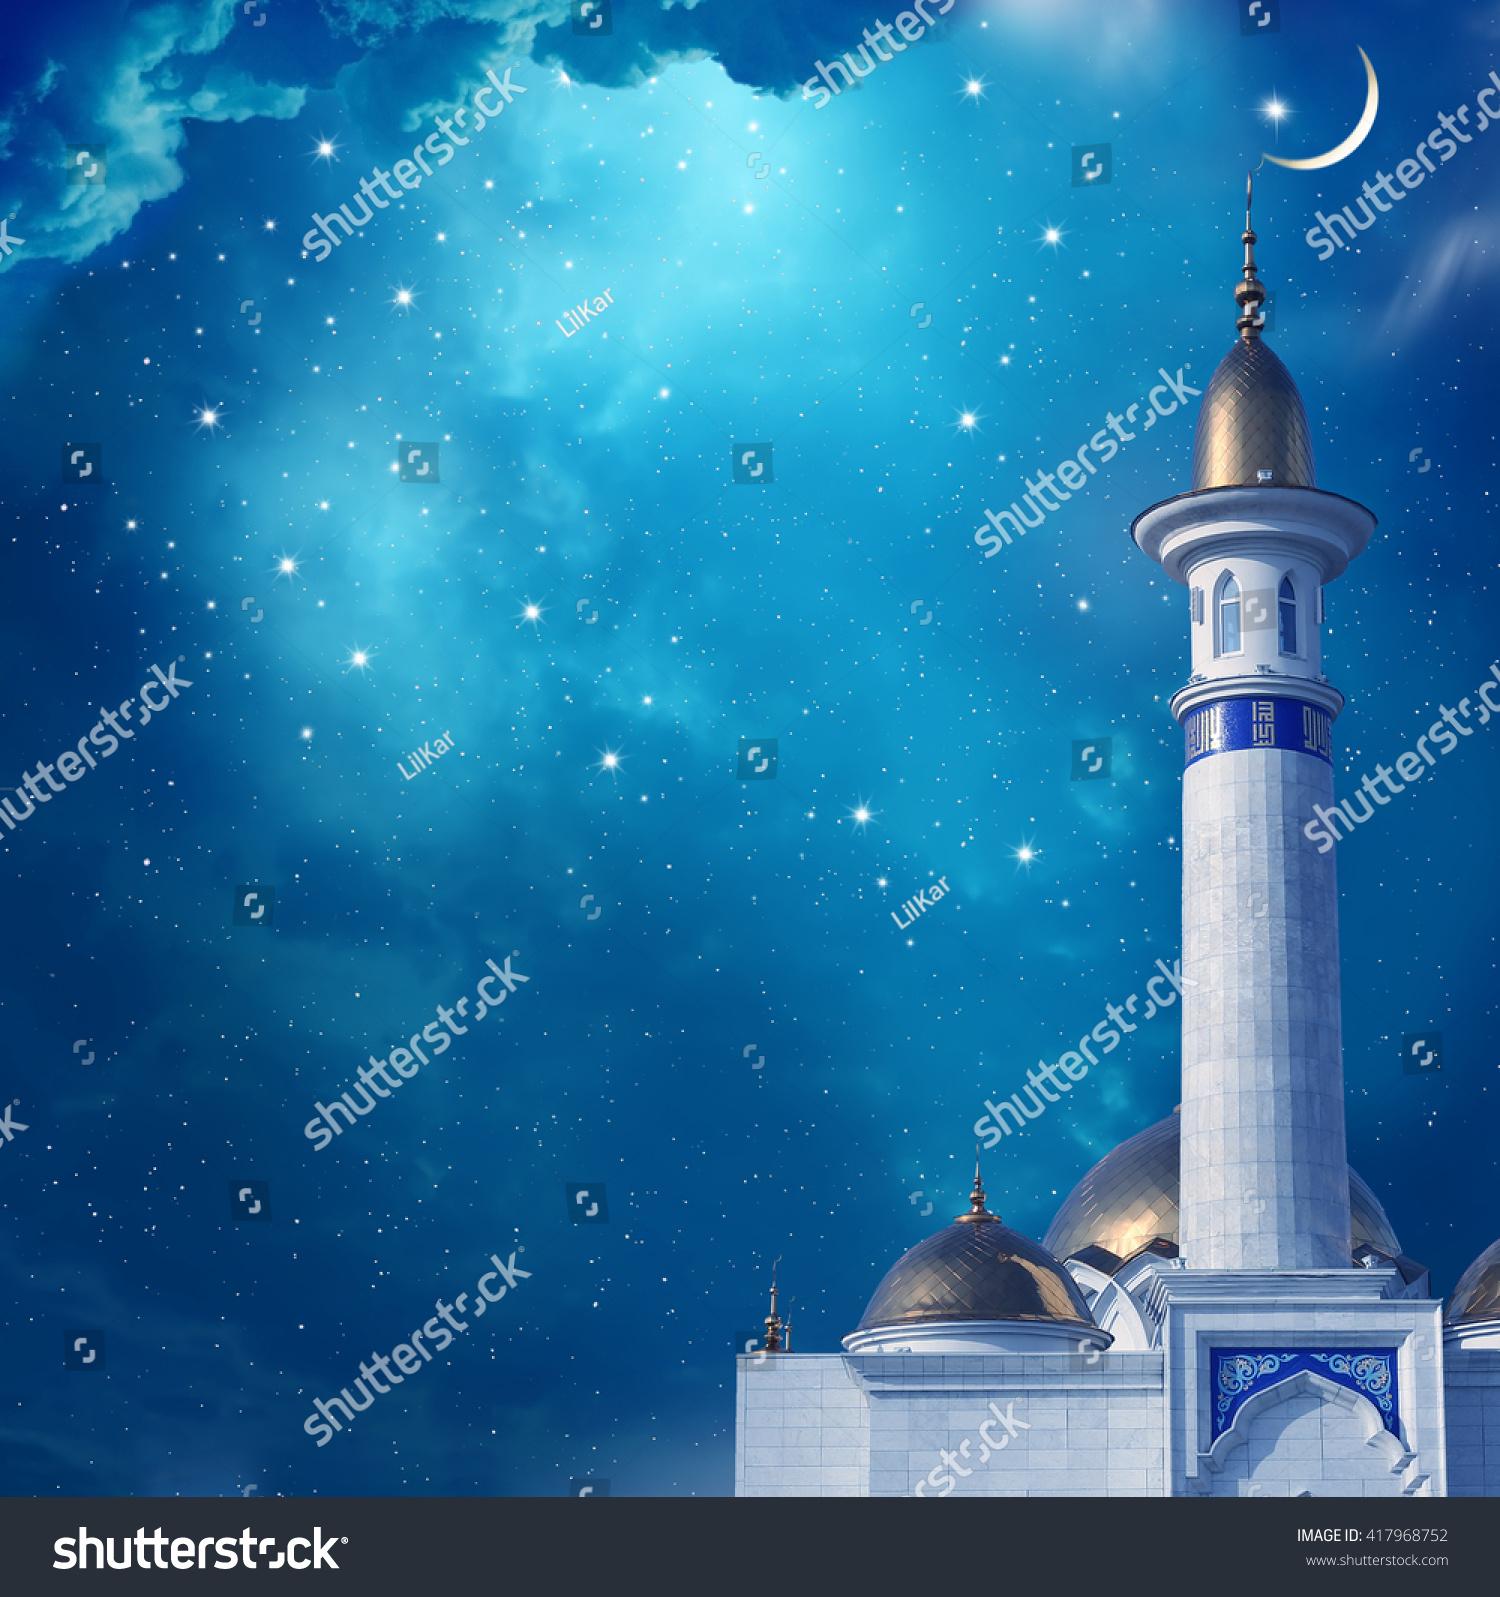 Mosque background for ramadan kareem stock photography image - Ramadan Kareem Background With Mosque